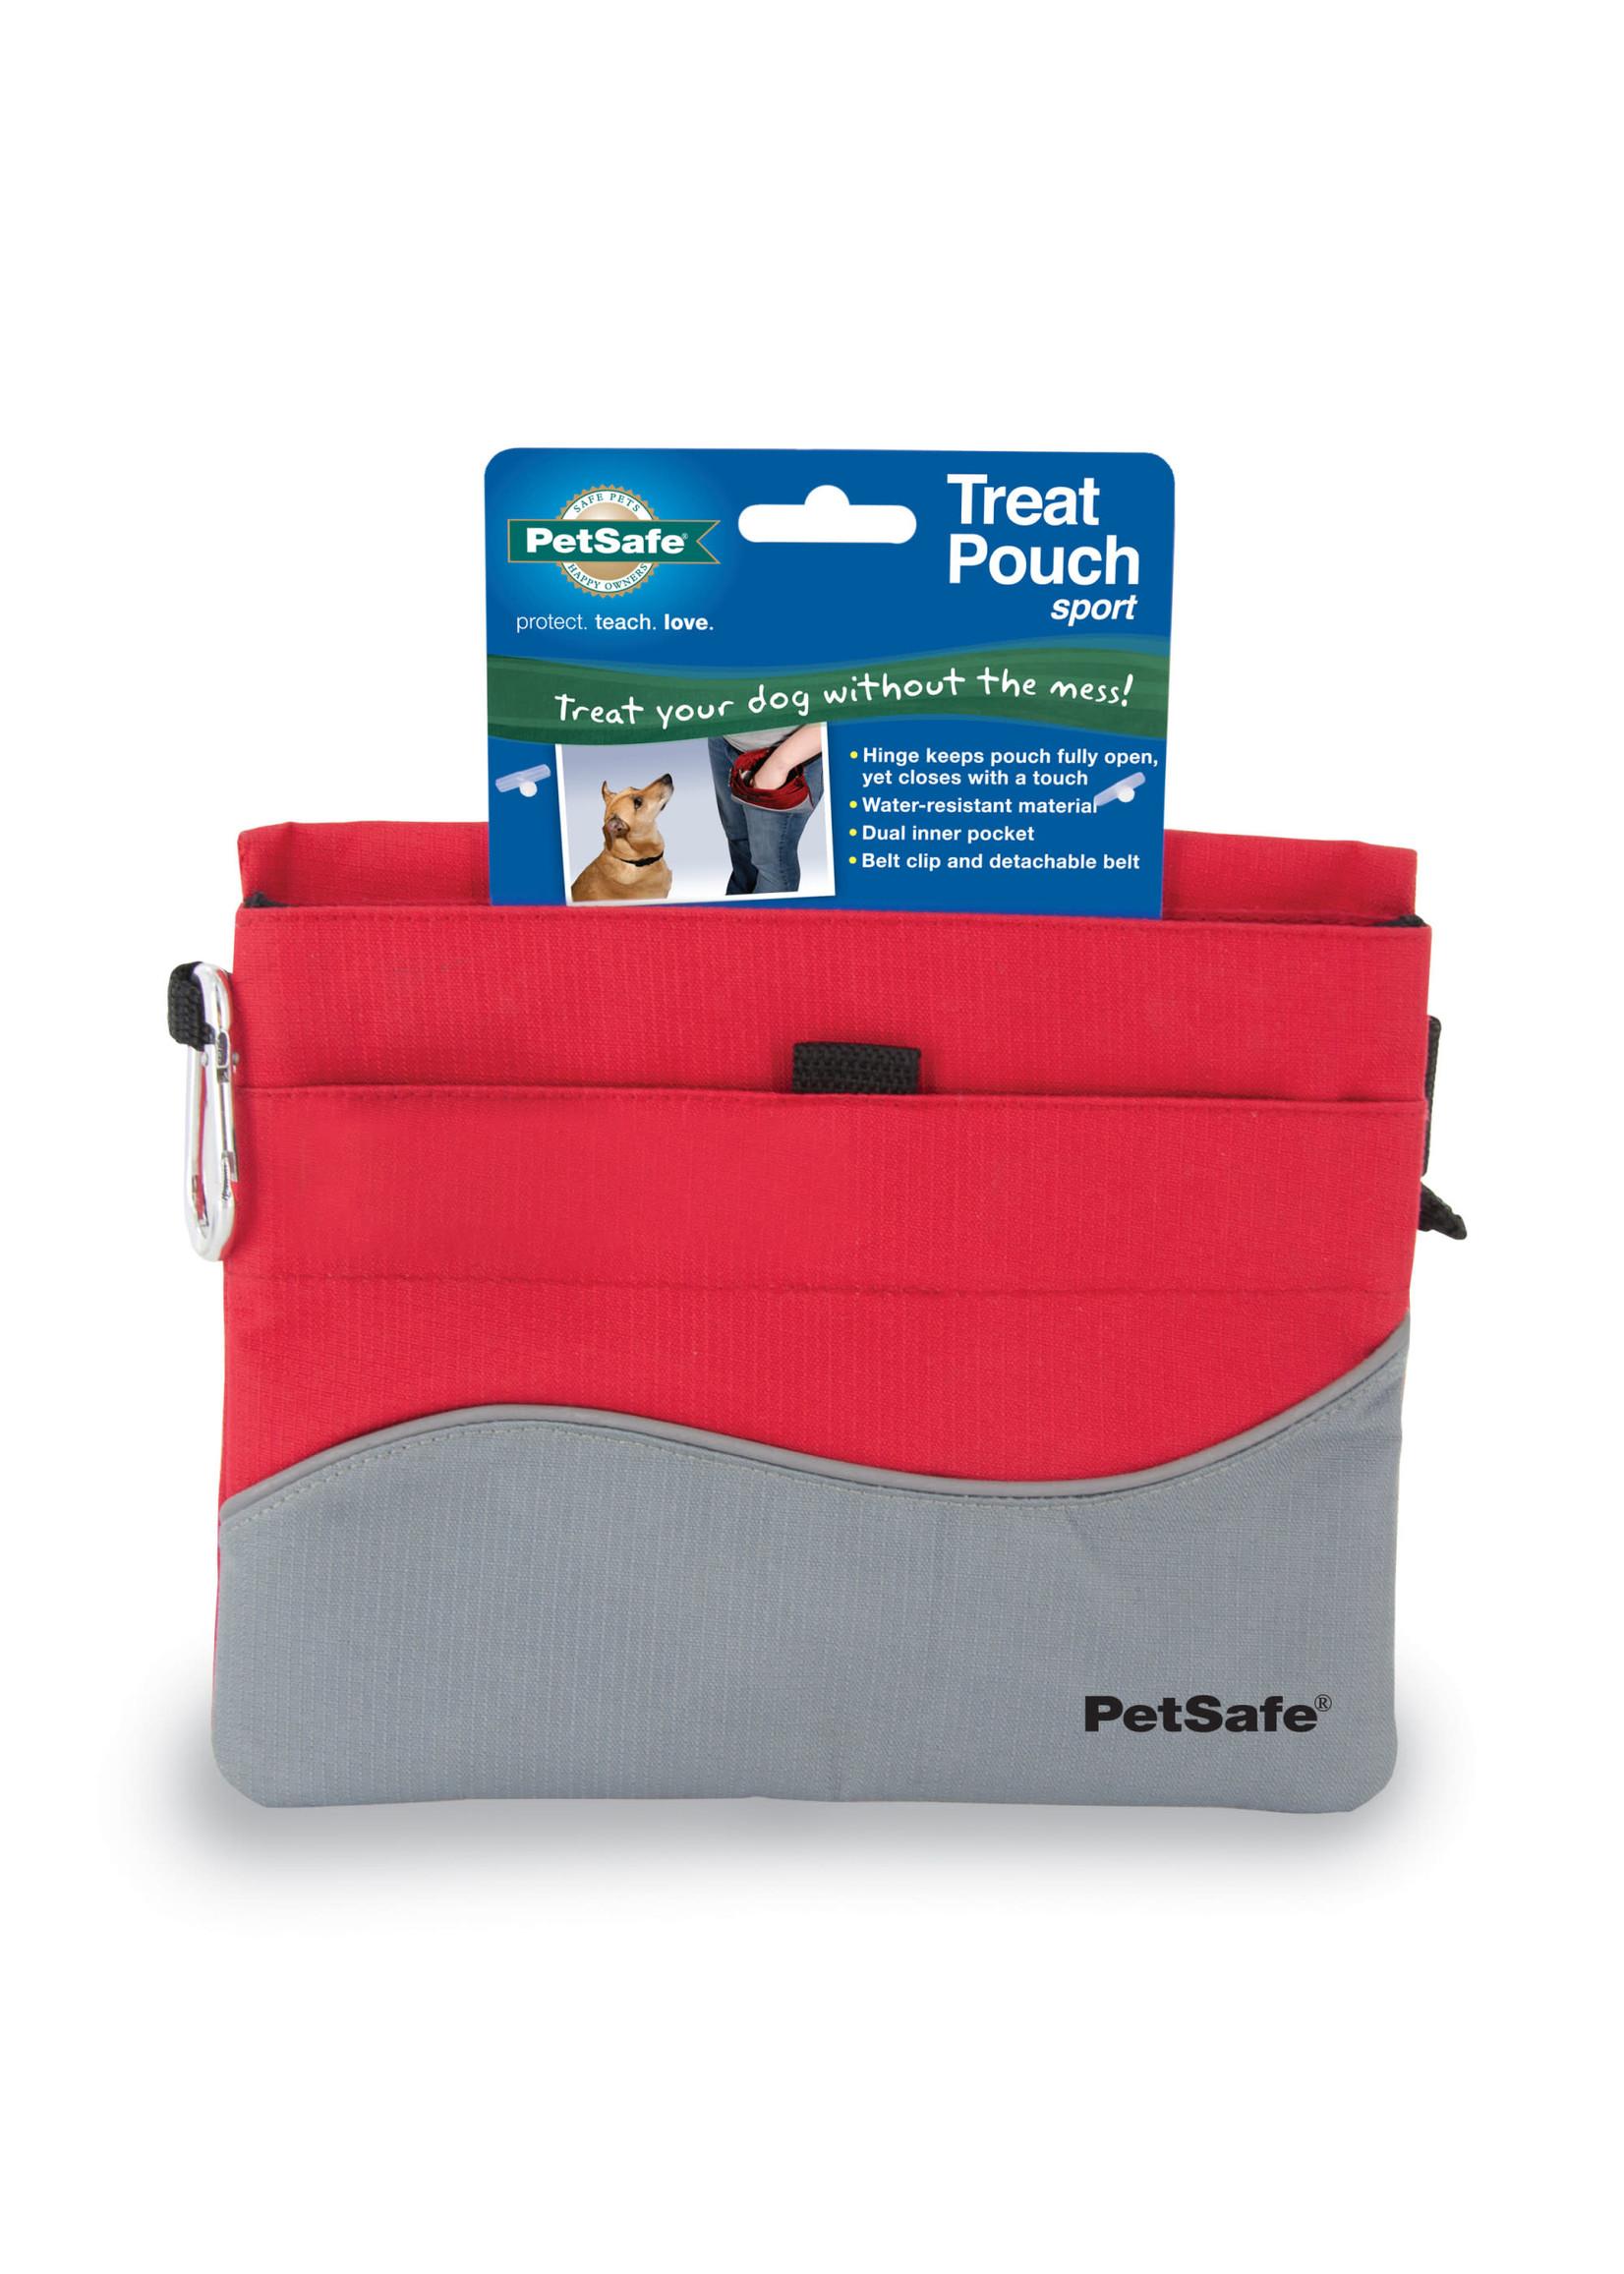 PetSafe PetSafe Treat Pouch Red